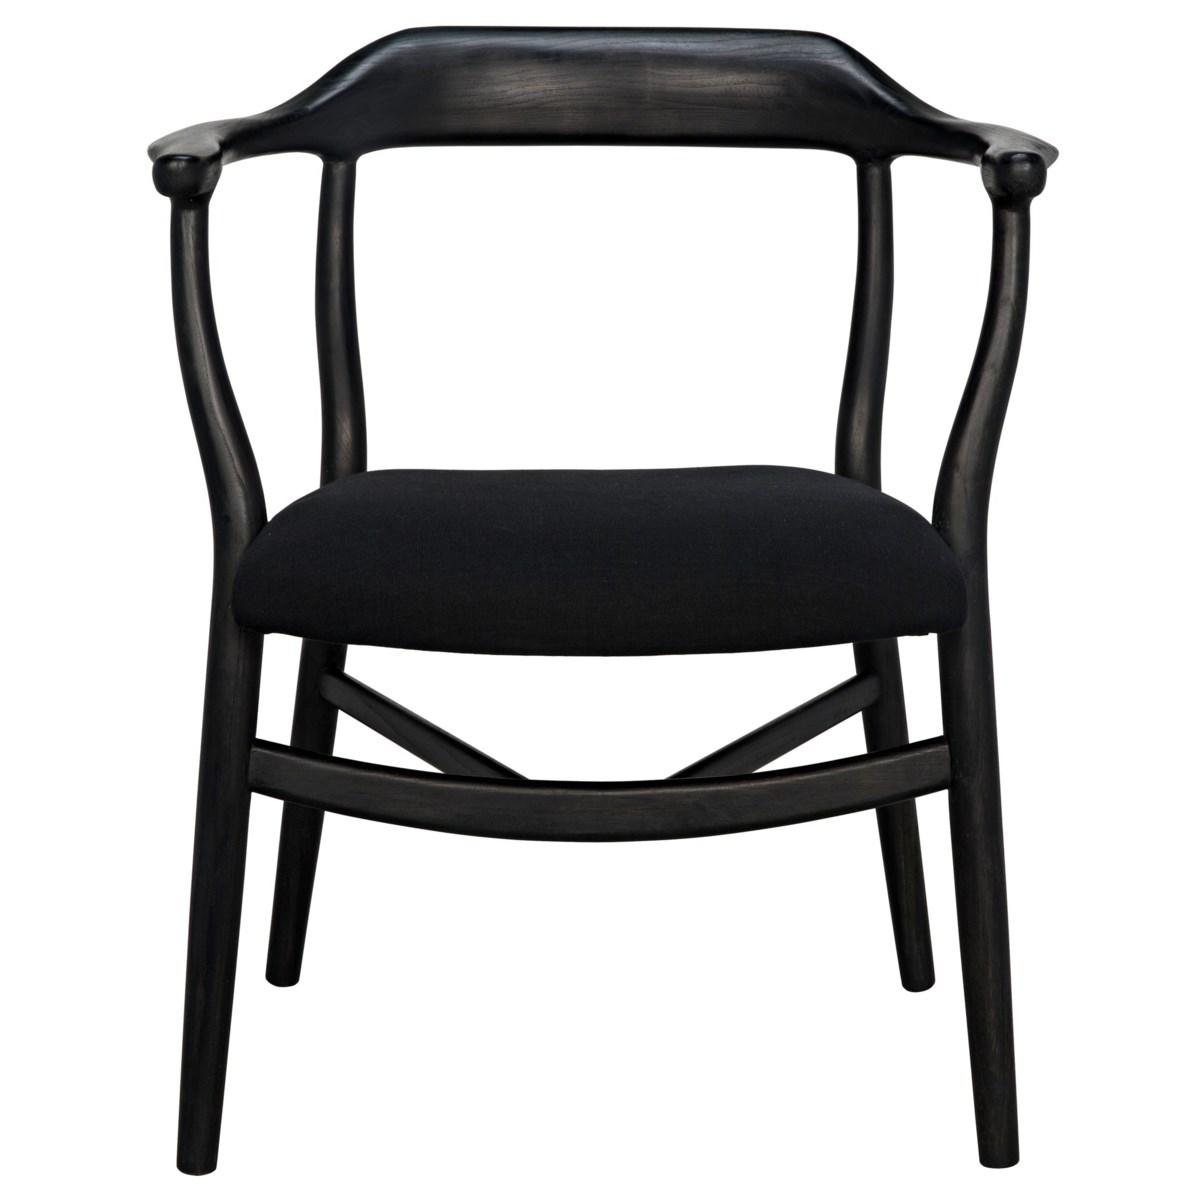 Rey Chair, Charcoal Black